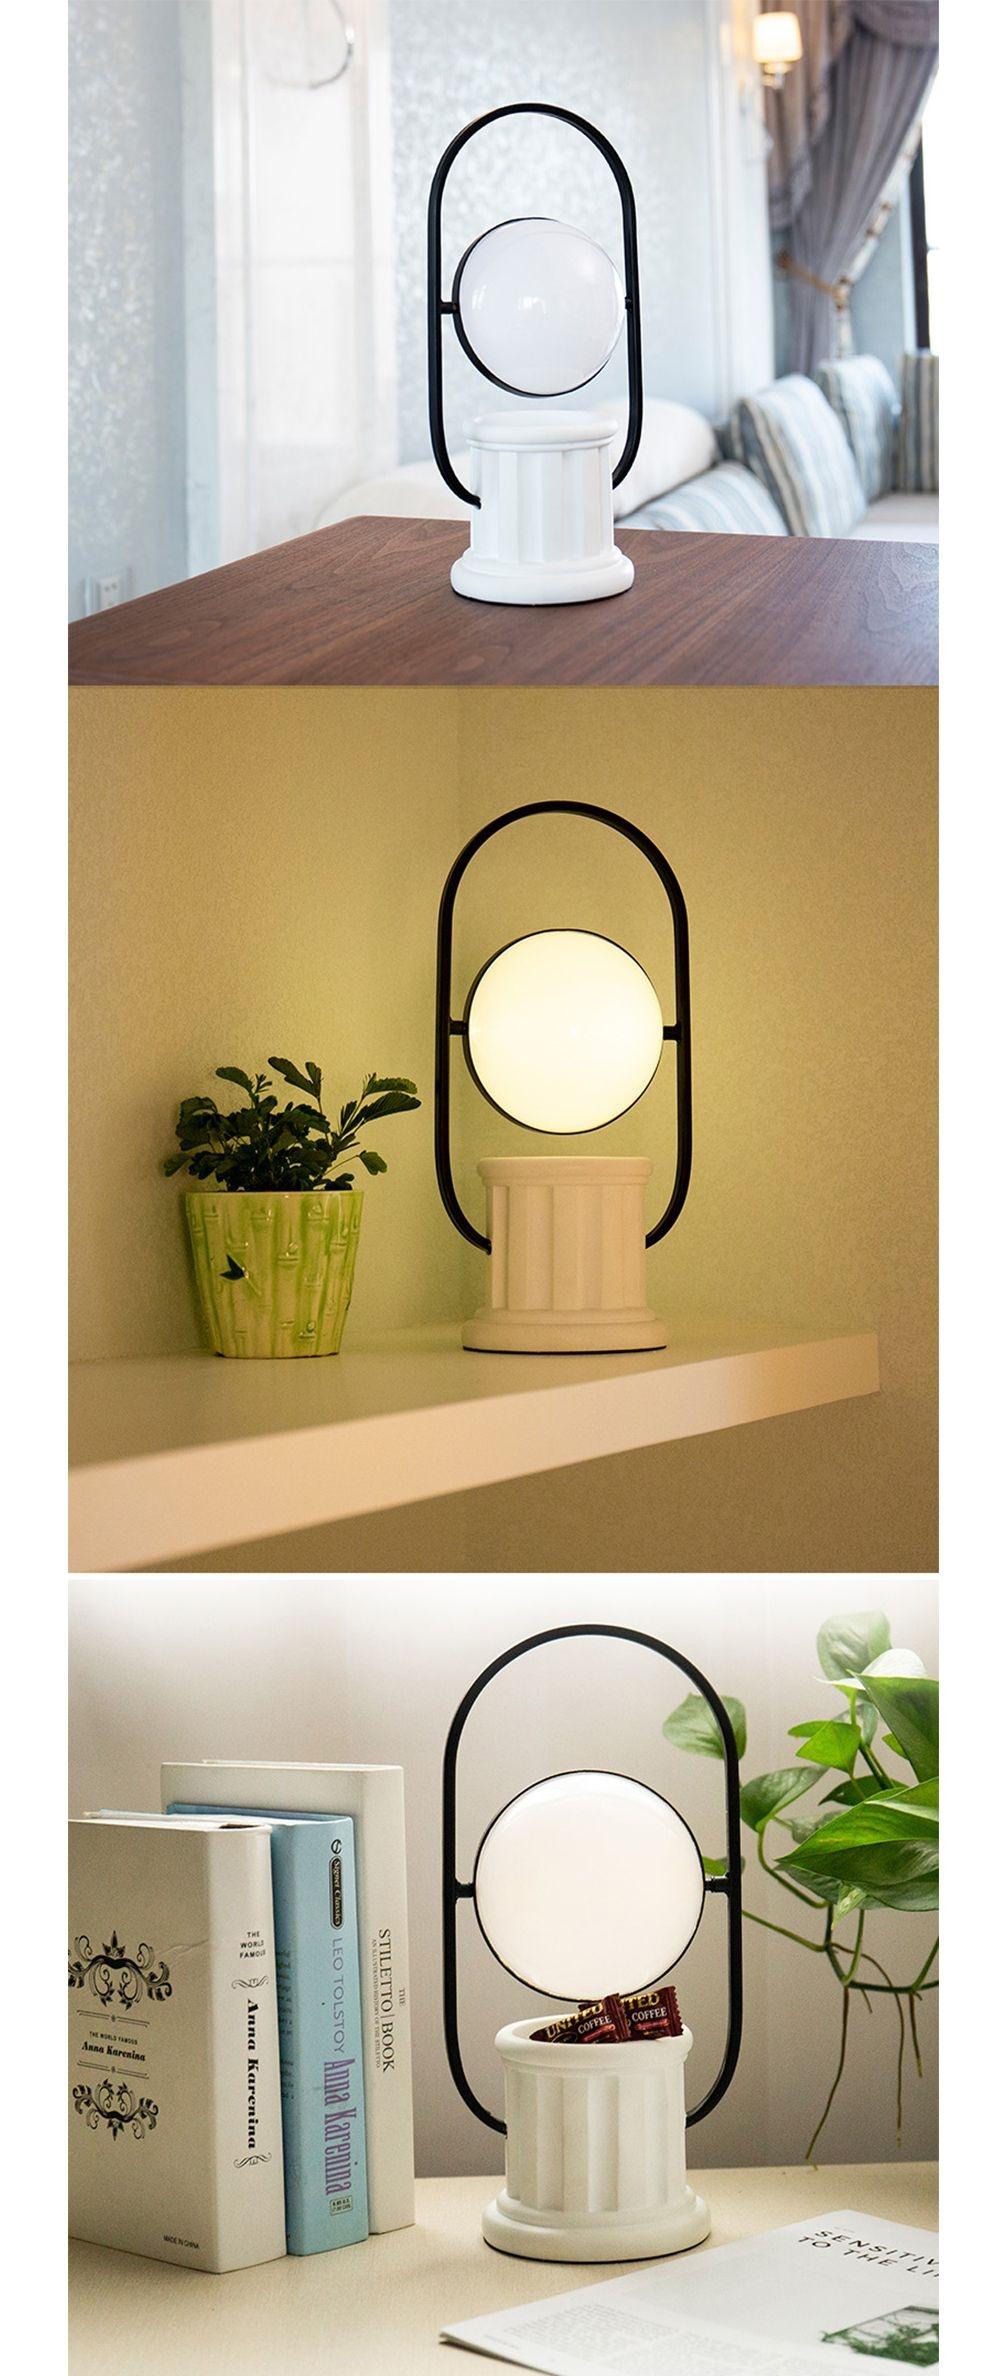 Emoji Lantern Creative Night Light